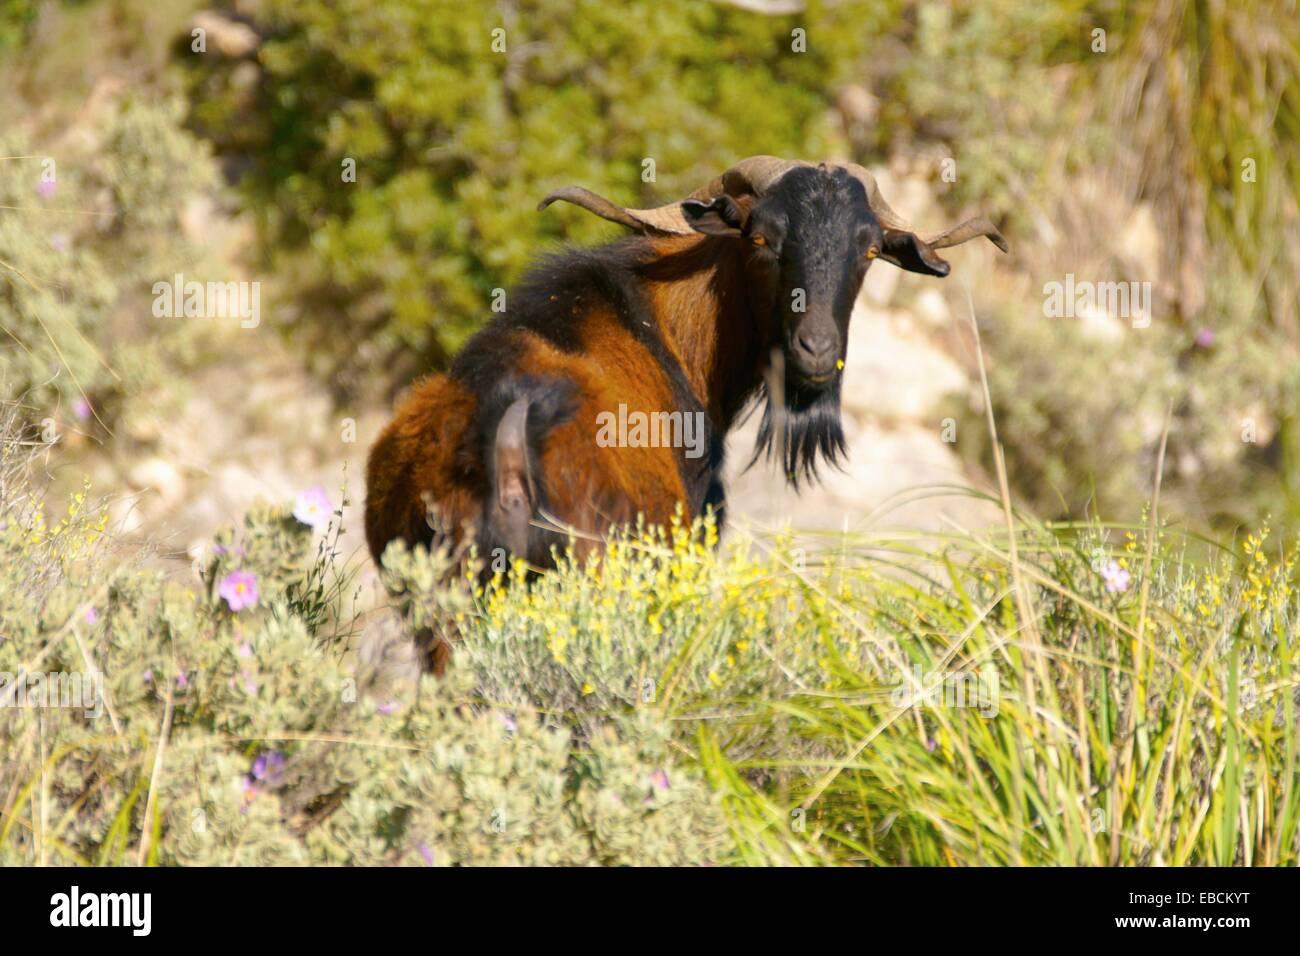 Boc Balear, wild goat, Andratx, Mallorca, Sierra de Tramuntana Trapa Balearic Spain - Stock Image